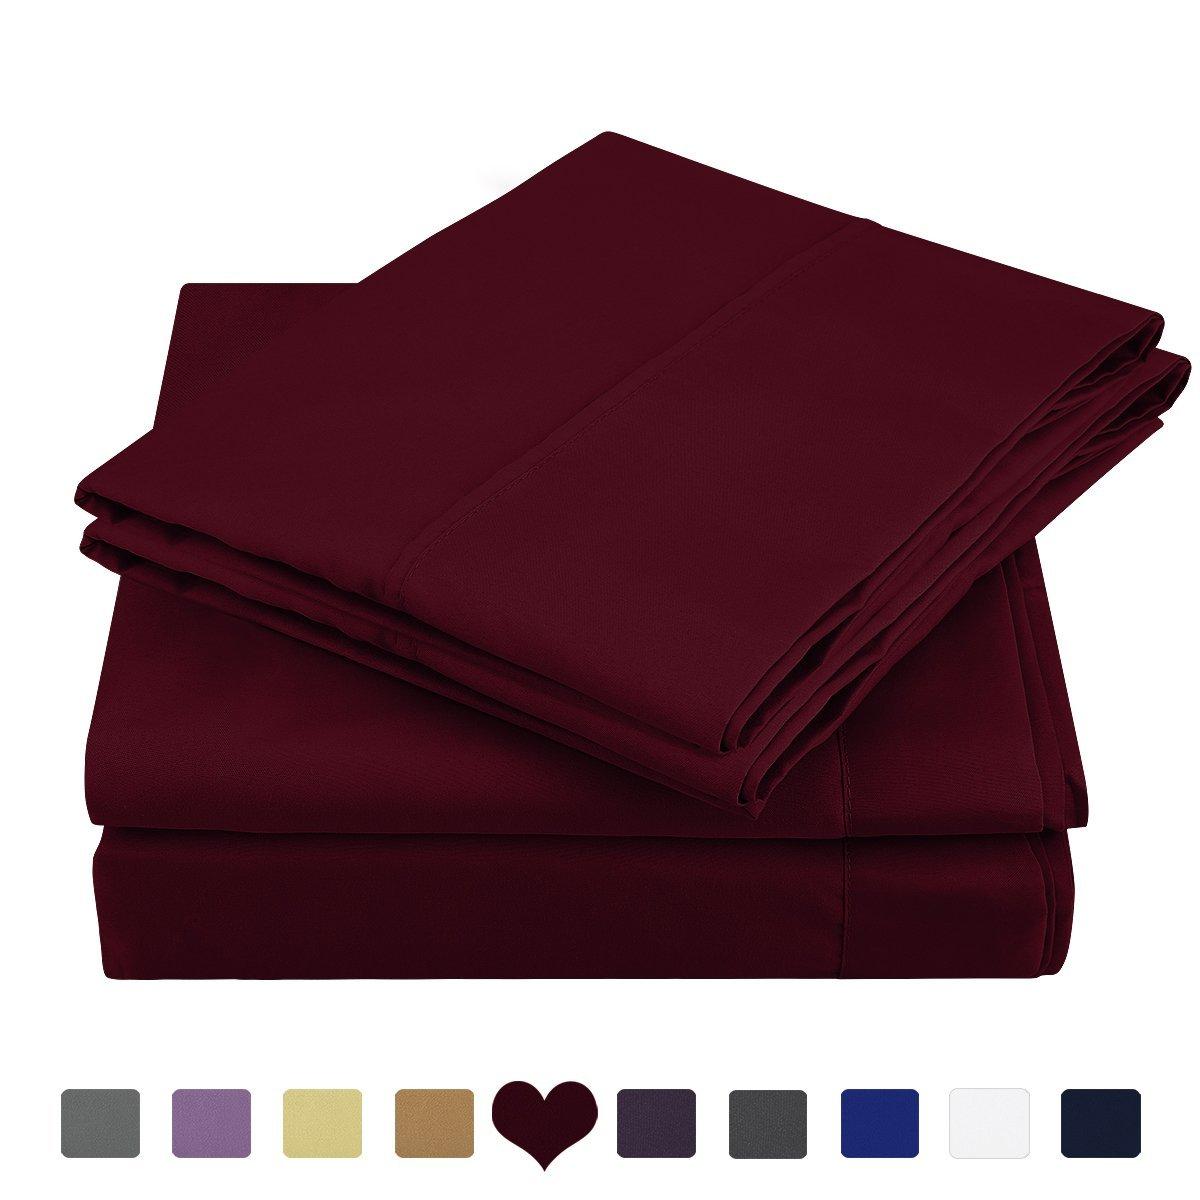 HOMEIDEAS 4 Piece Bed Sheet Set (Full,Burgundy) 100% Brushed Microfiber 1800 Bedding Sheets Deep Pockets,Wrinkle & Fade Resistant